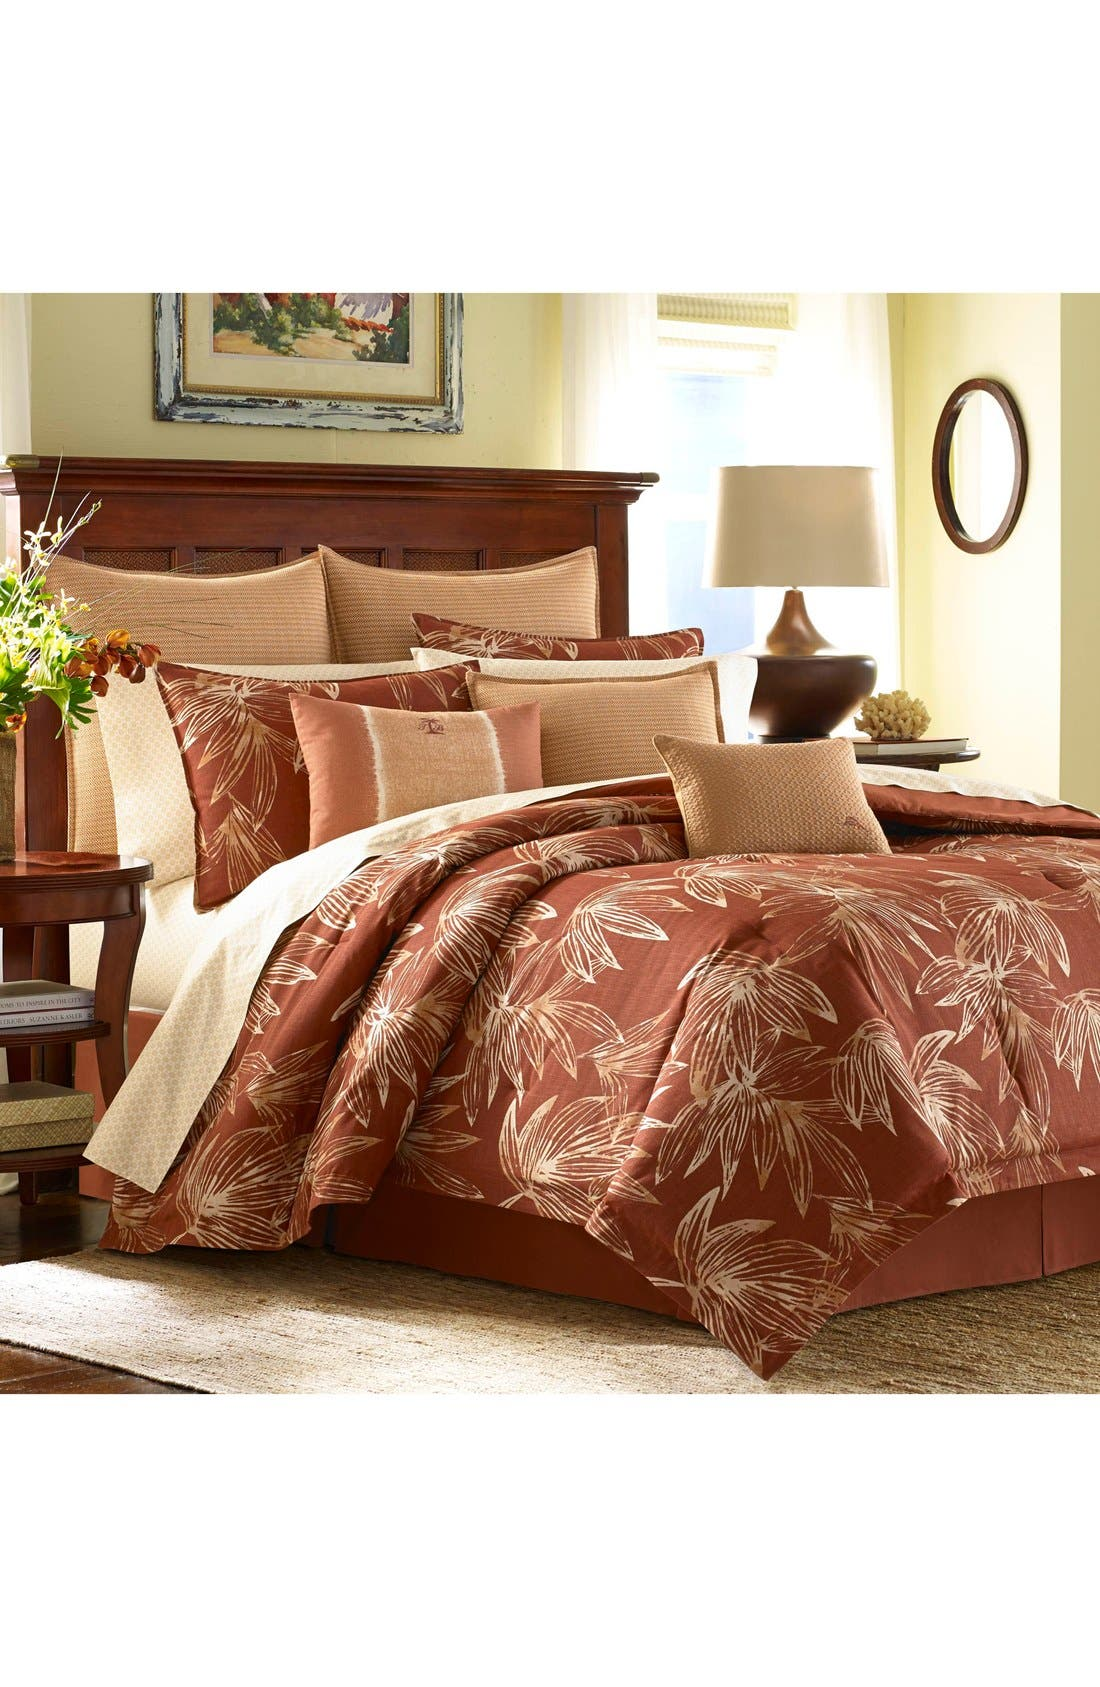 Main Image - Tommy Bahama Cayo Coco Comforter, Sham & Bed Skirt Set